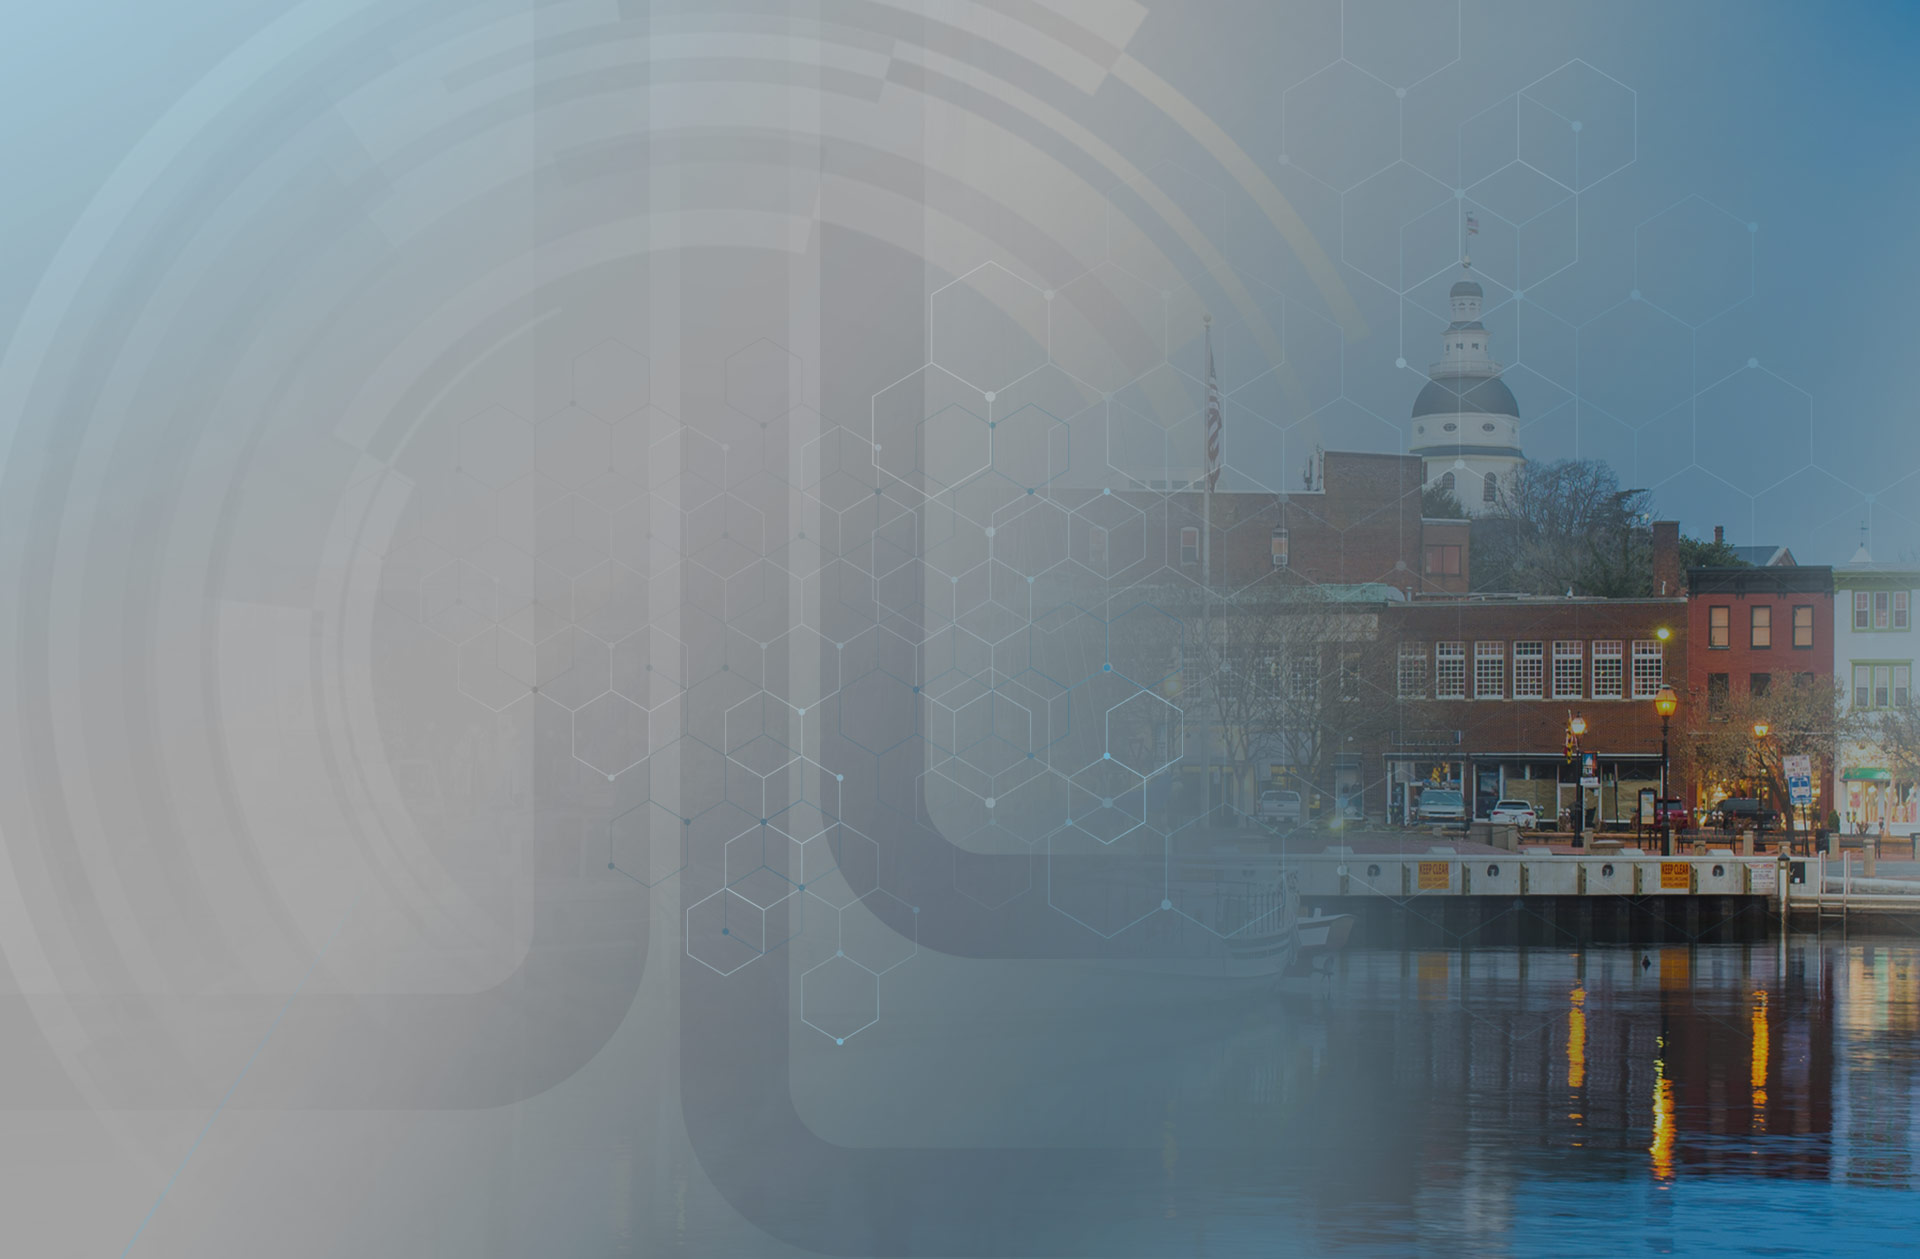 LD-2020-Annapolis-Hubspot-1920